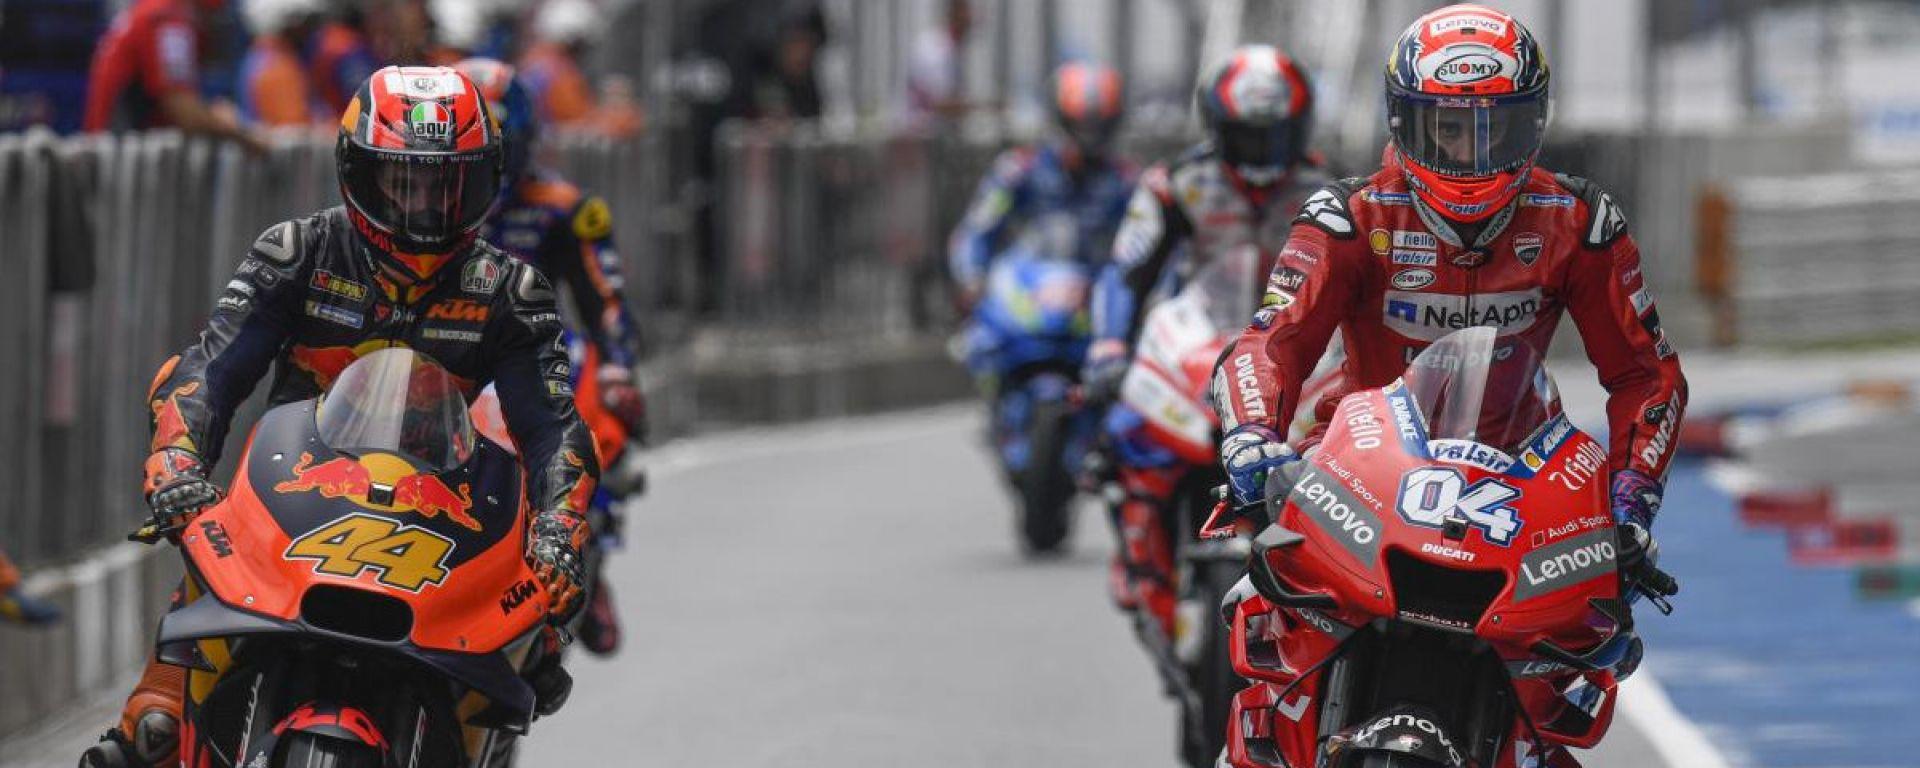 GP Thailandia 2019, Buriram: Pol Espargaro (KTM) e Andrea Dovizioso (Ducati)